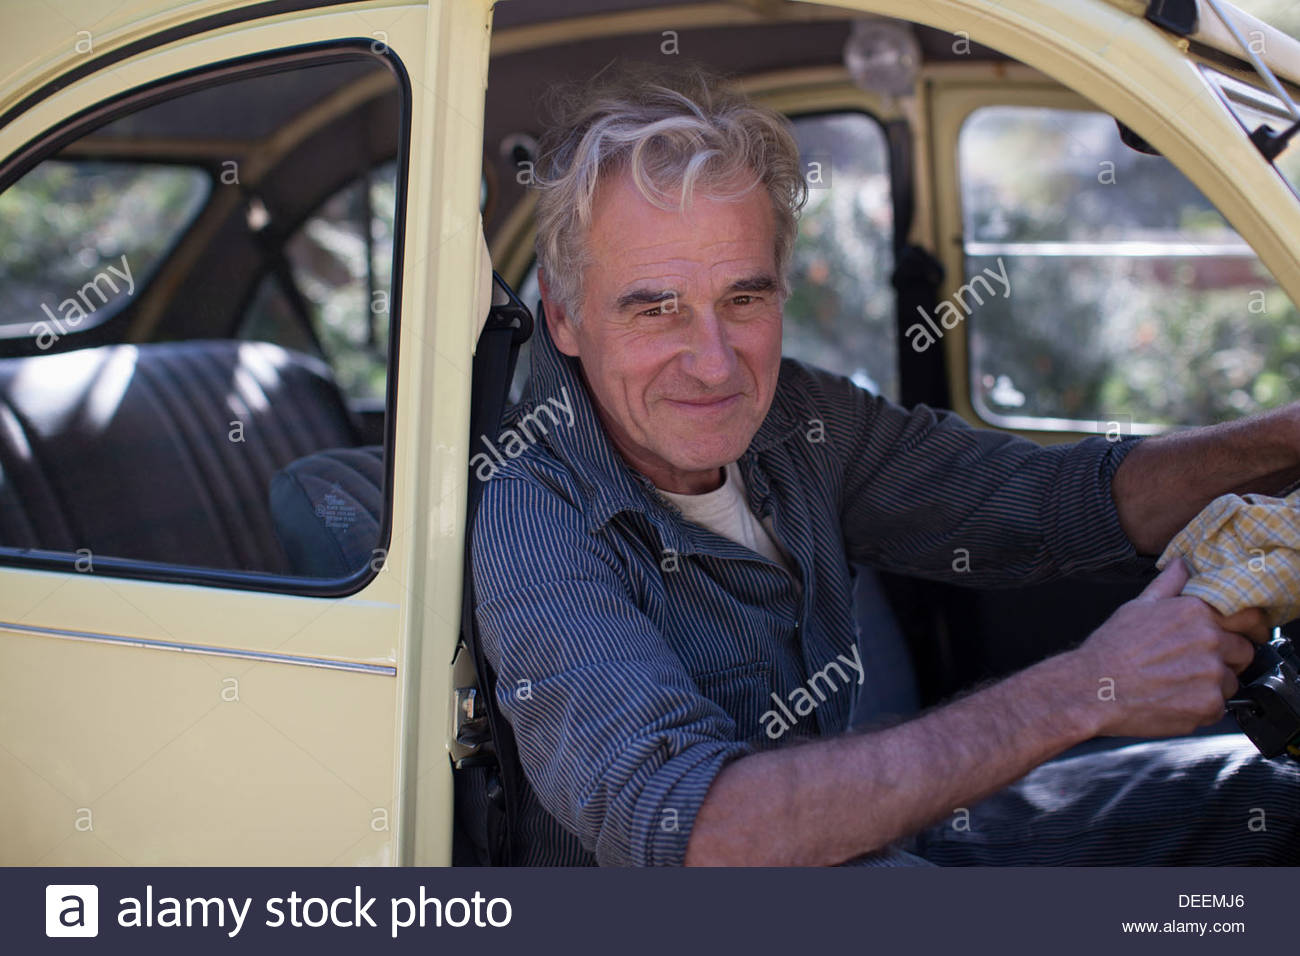 Portrait of smiling senior man in car doorway - Stock Image